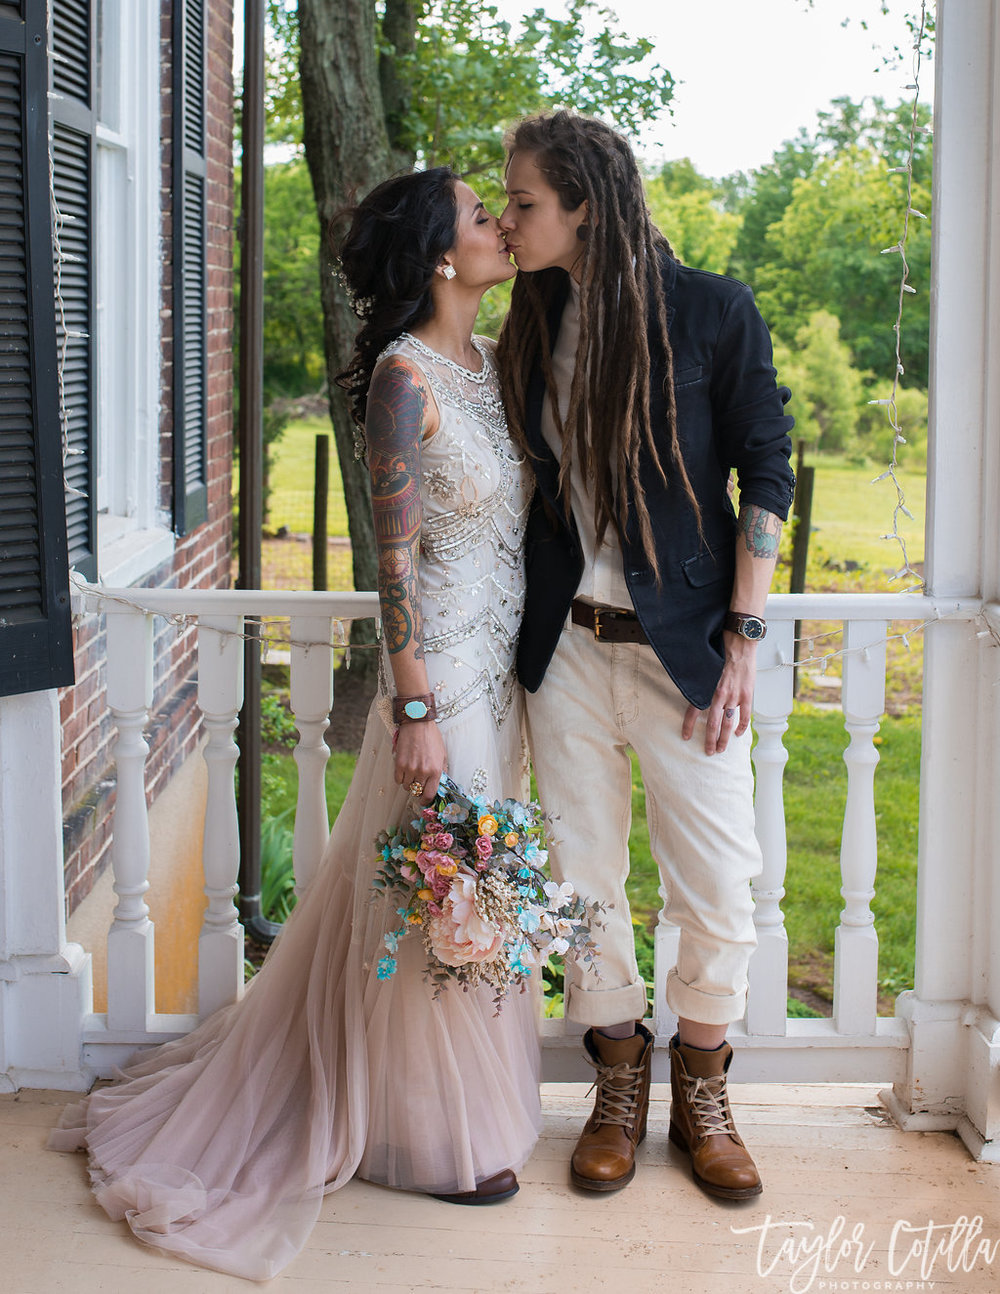 ceremony-pink-flower-silks-boots-wedding